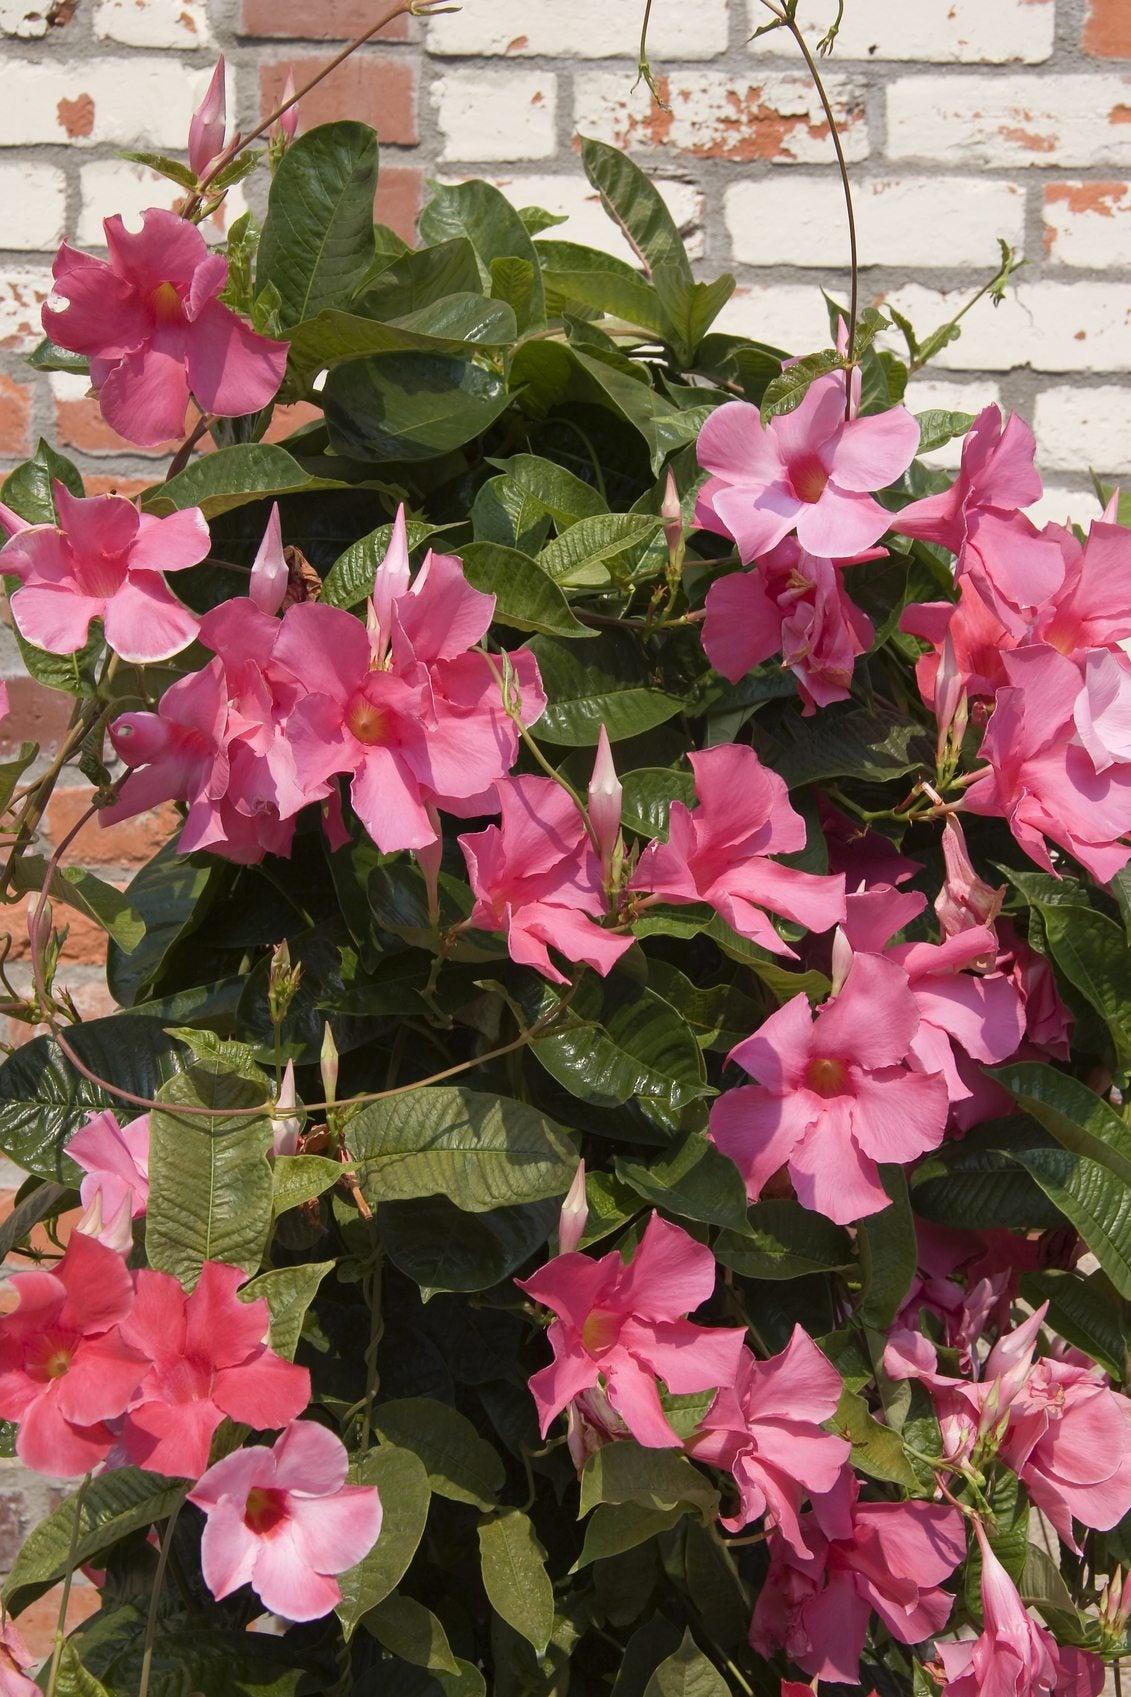 Pruning Mandevilla Vines How To Cut Back A Mandevilla Properly